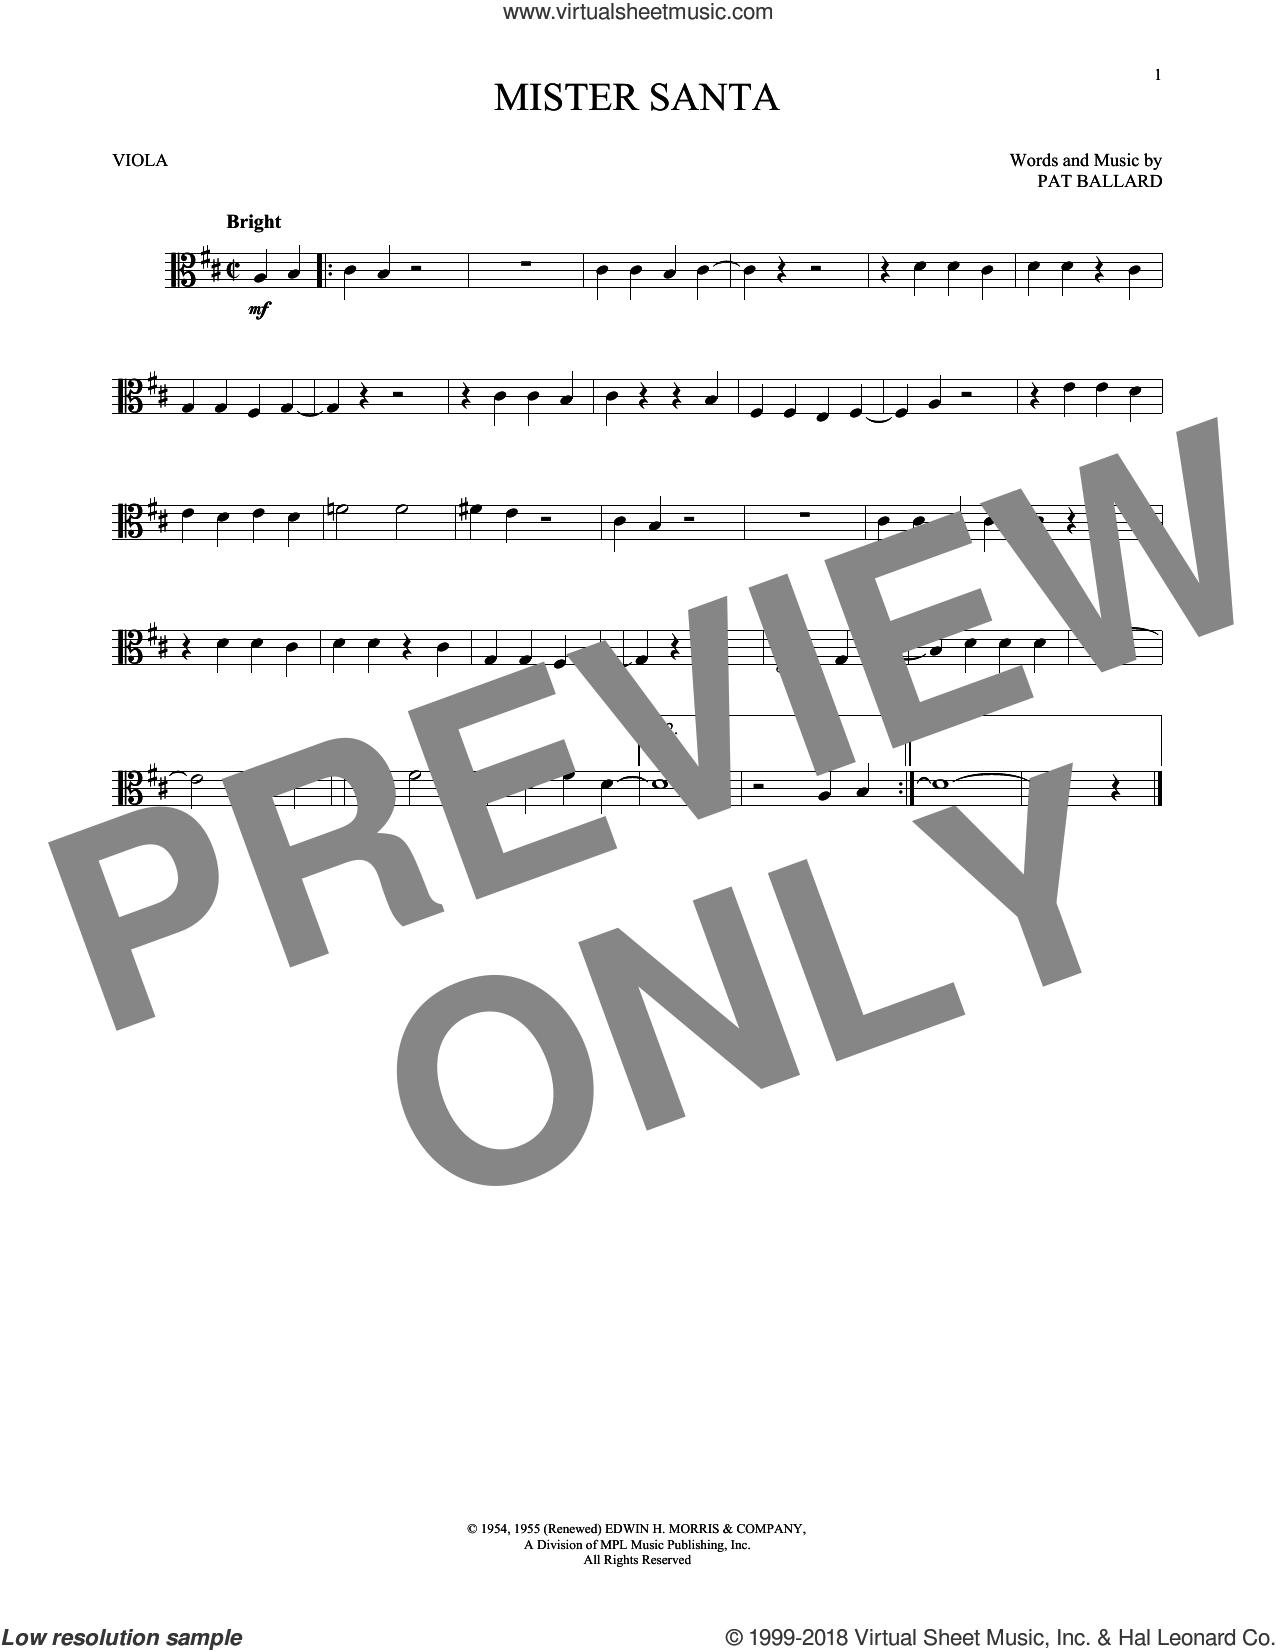 Mister Santa sheet music for viola solo by Amy Grant and Pat Ballard, intermediate skill level